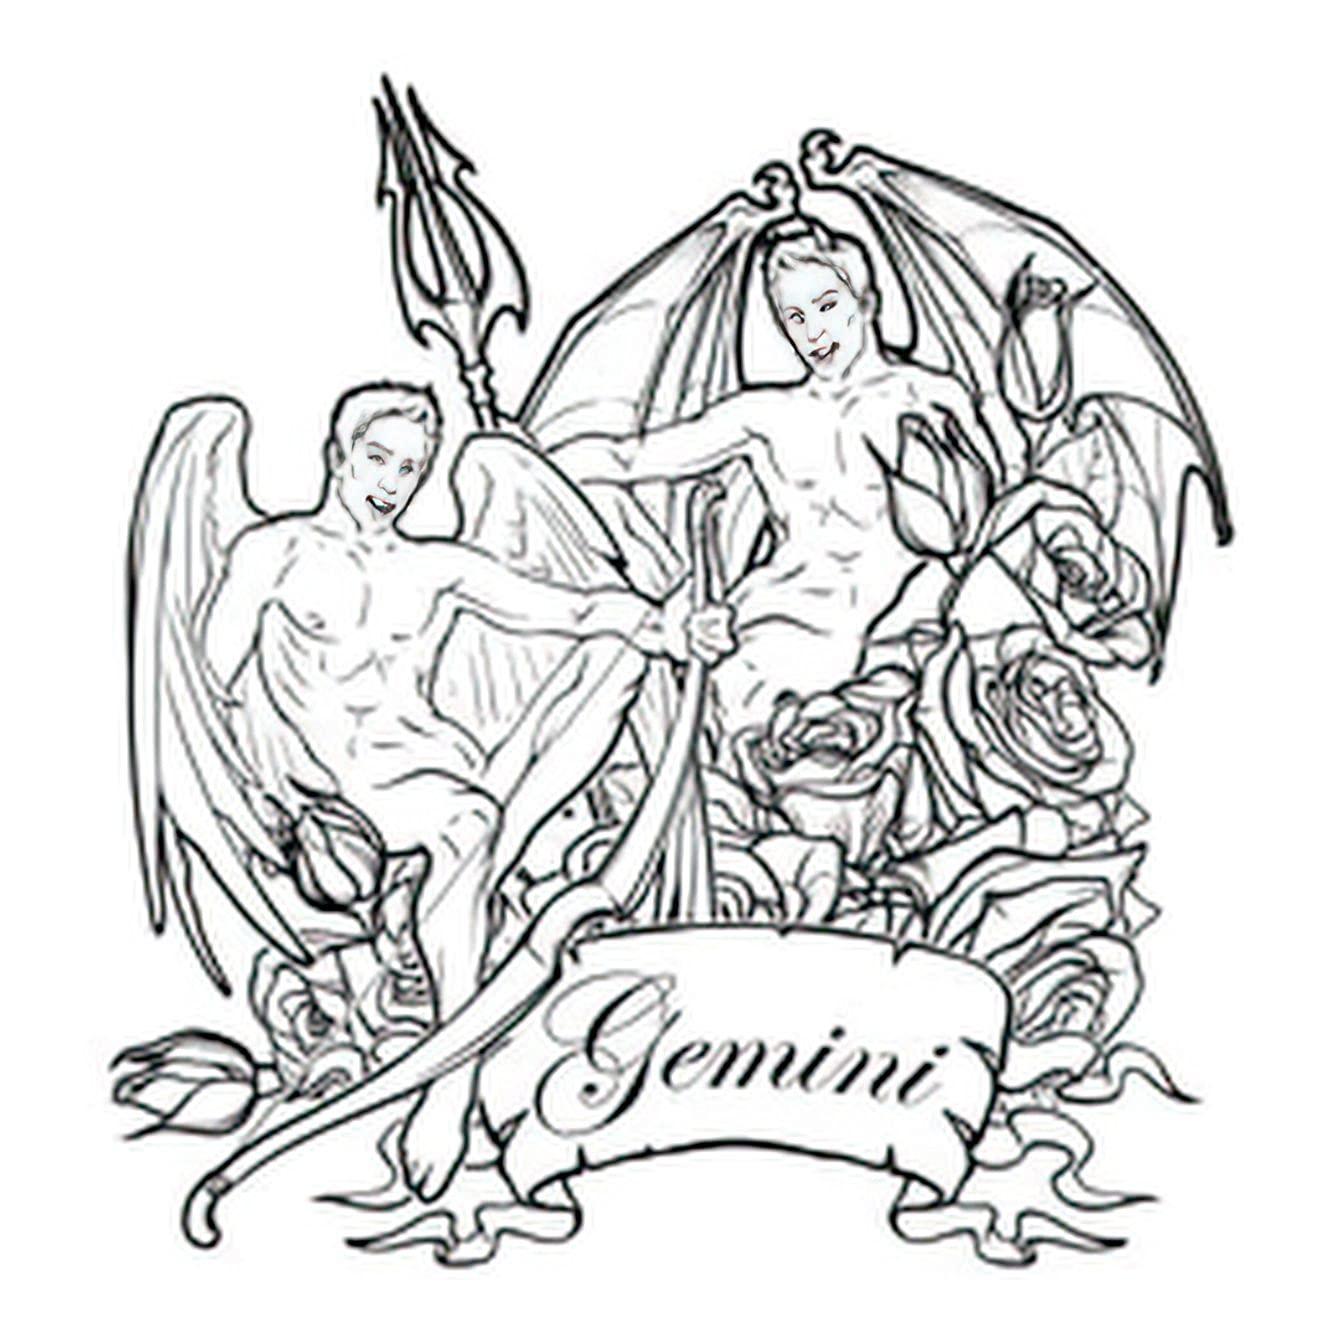 Gemini Zodiac Sign Tattoos